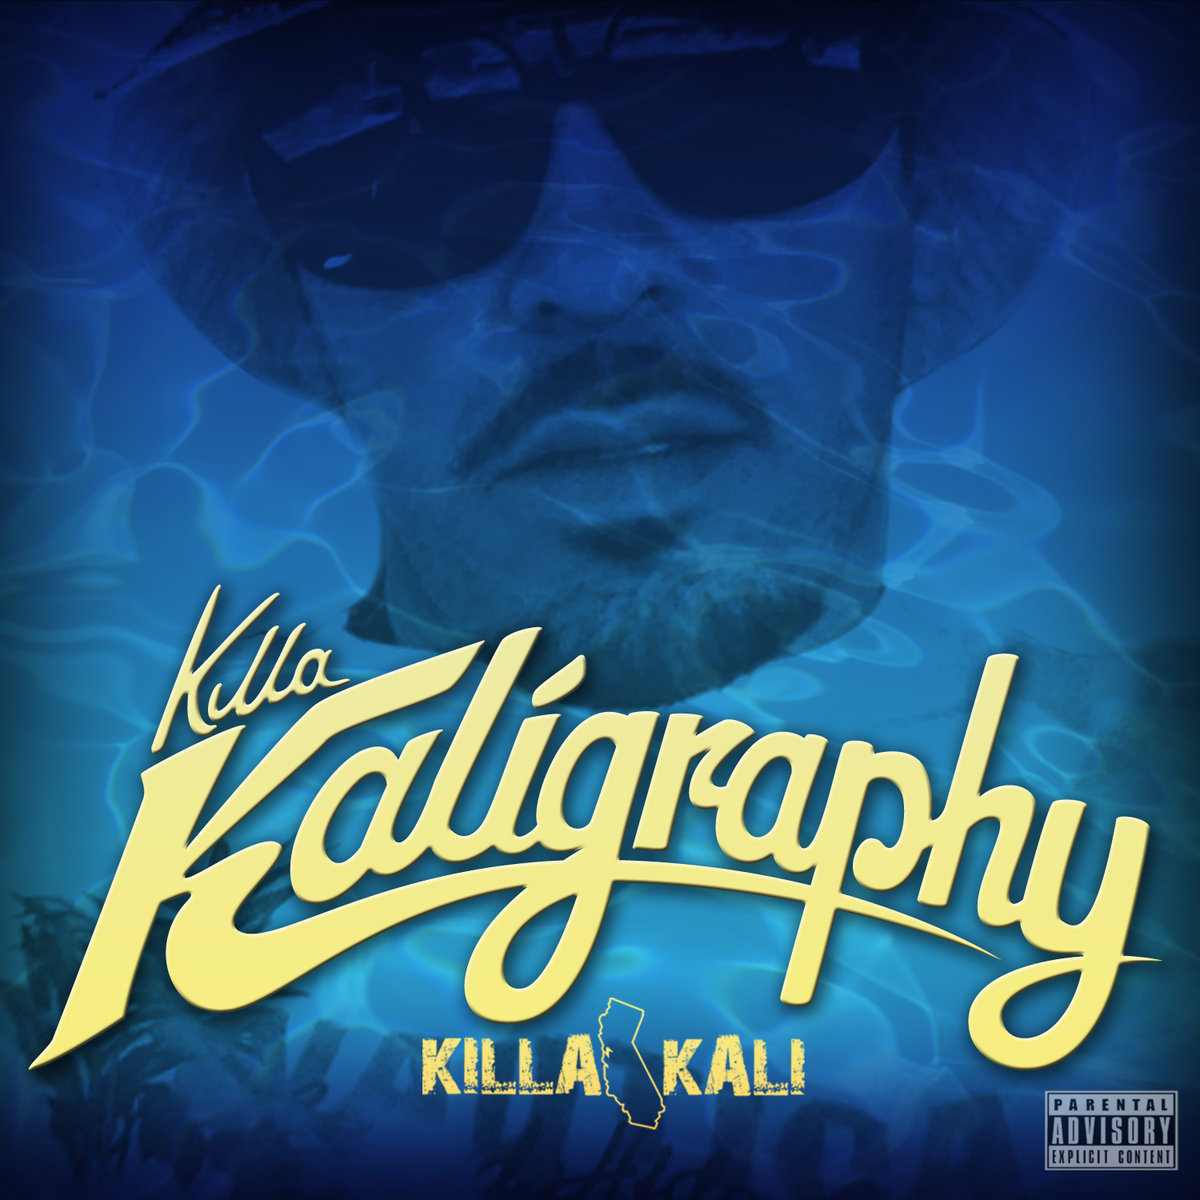 Killa_kaligraphy